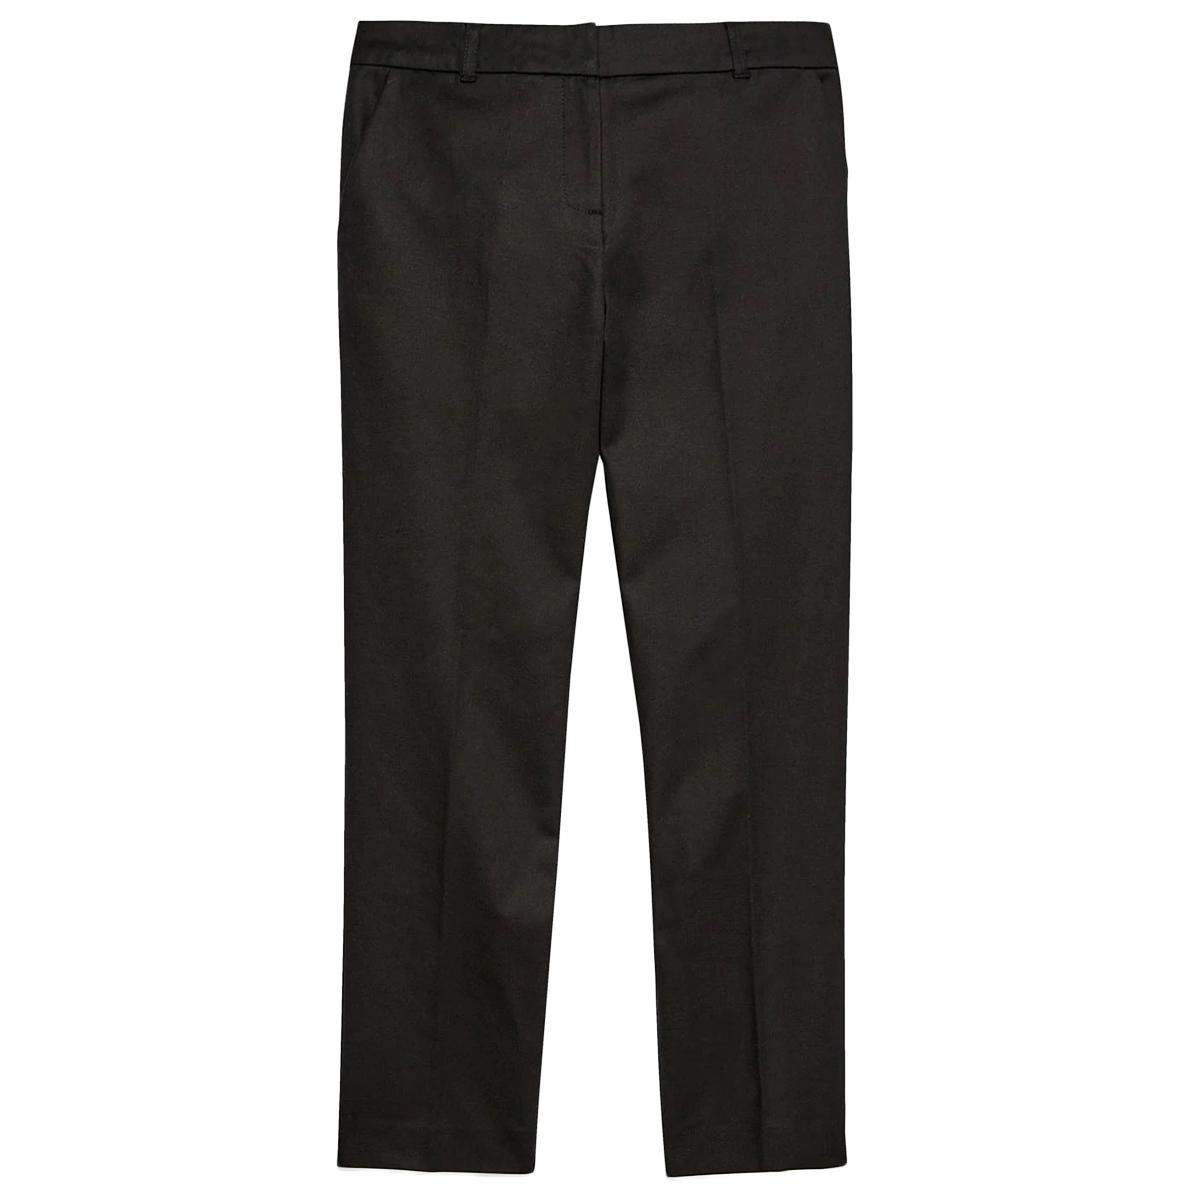 Jack Wills Women's Arianna Slim Trouser Pants - Black, 6